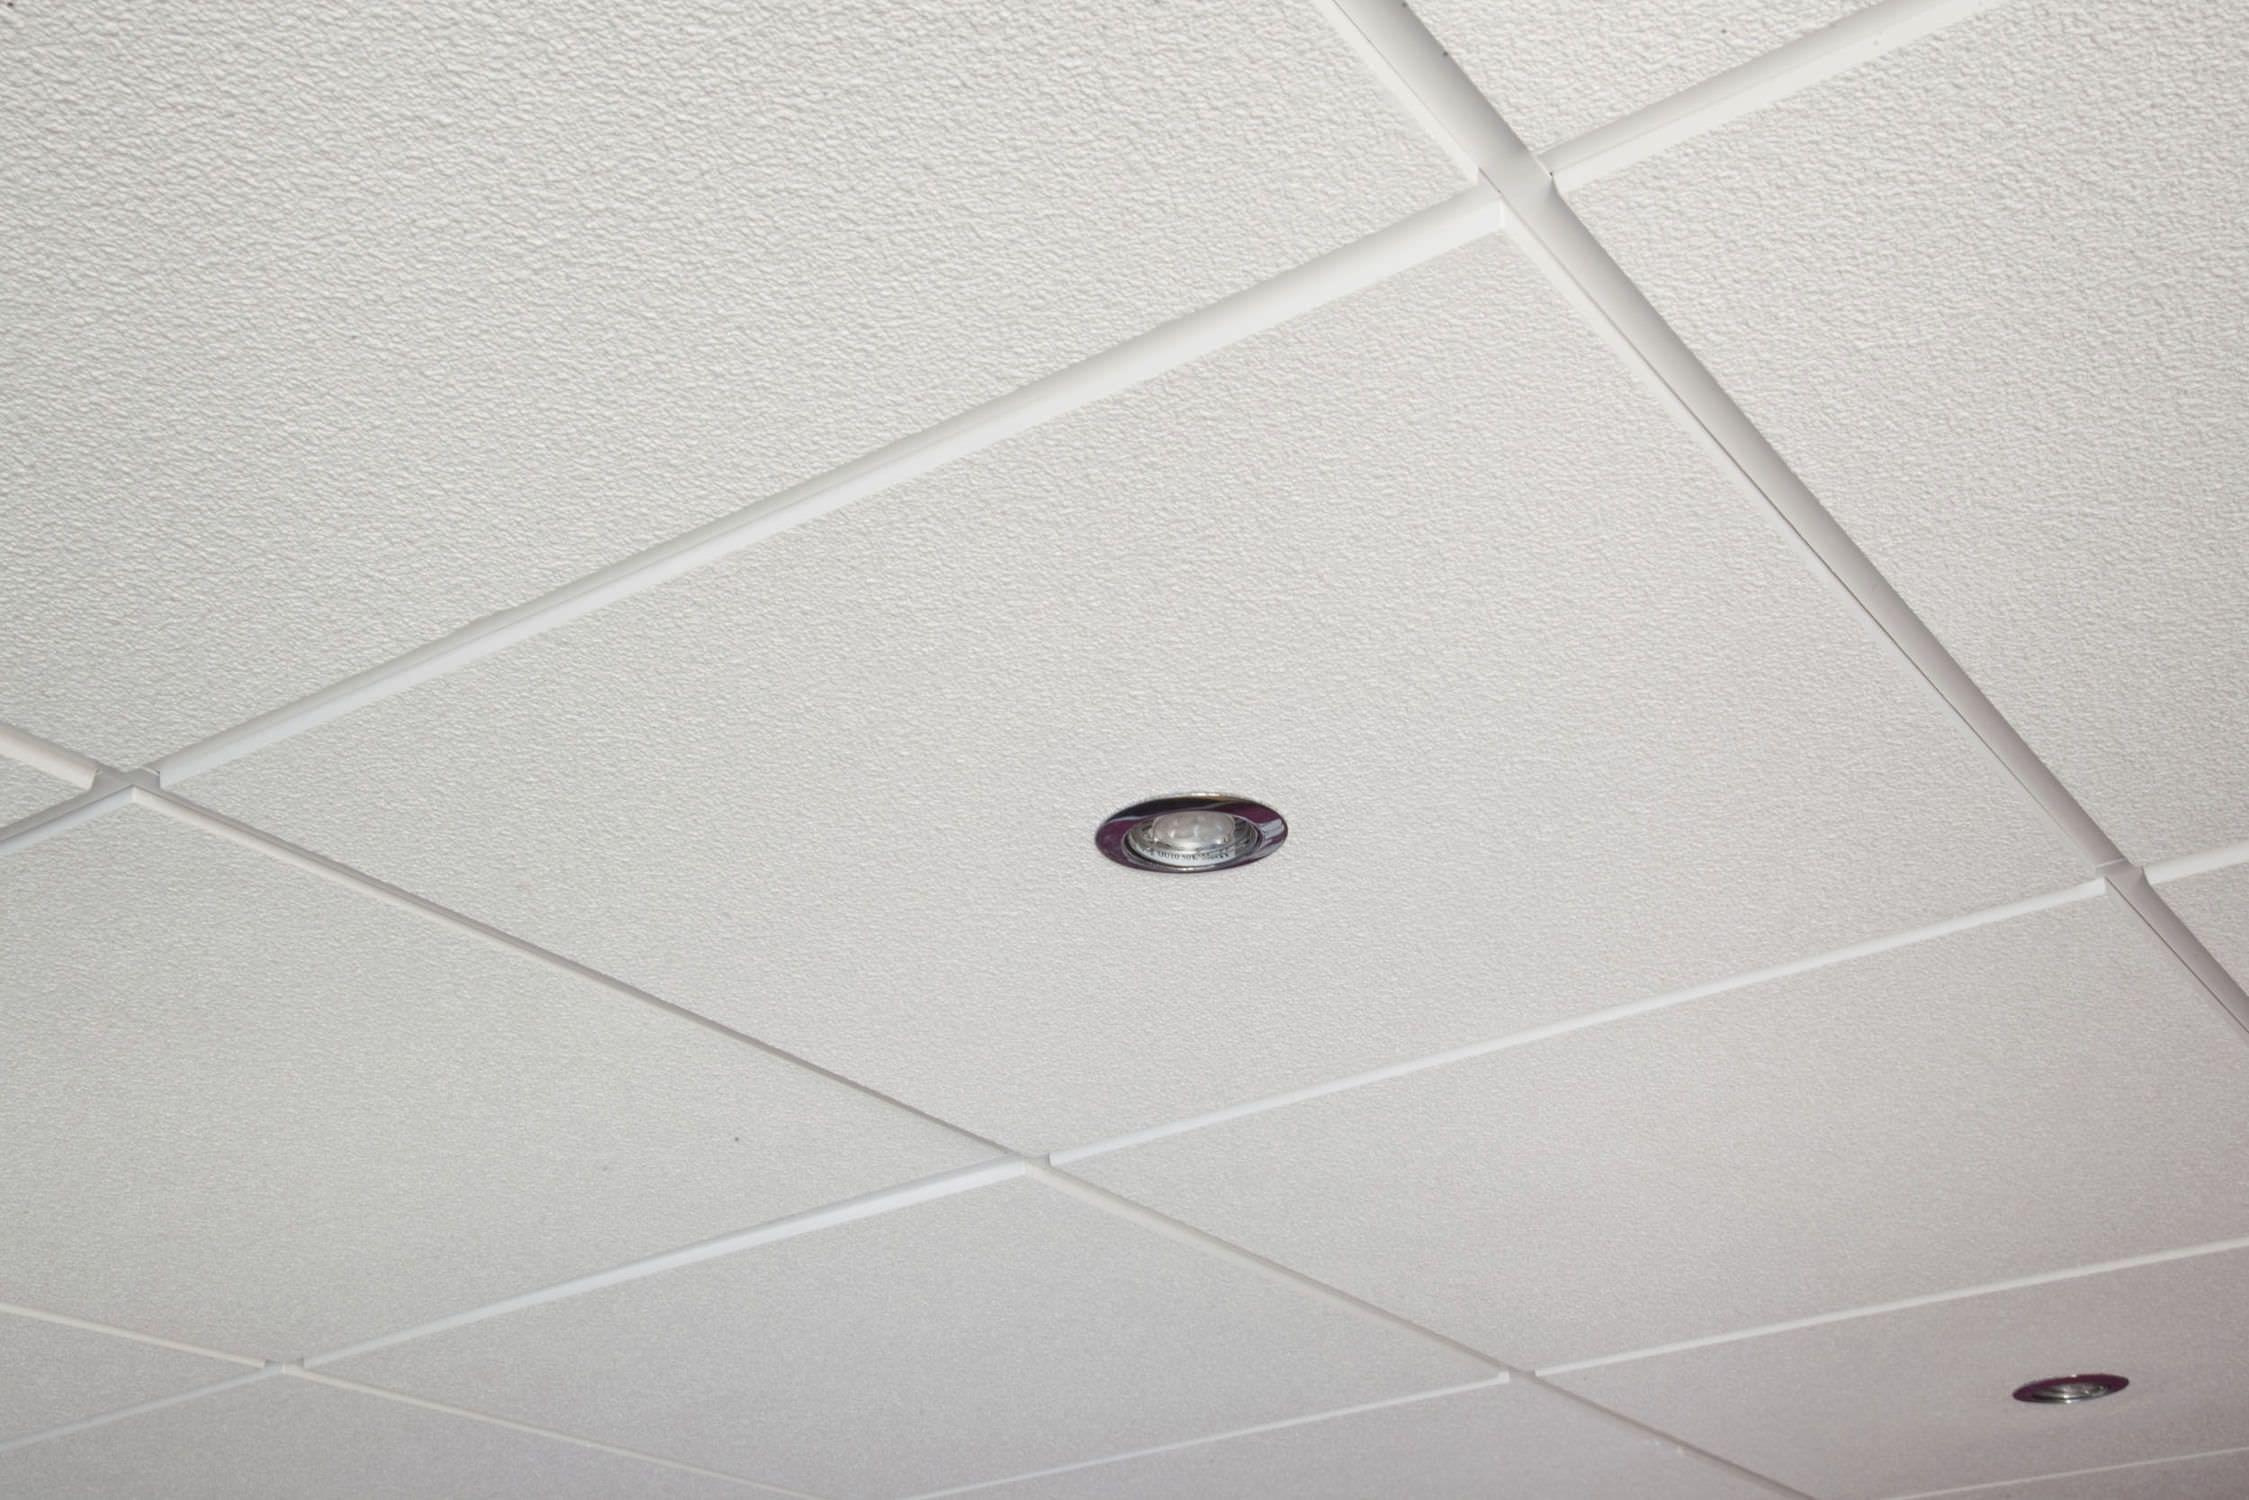 Armstrong Vinyl Faced Gypsum Ceiling Tiles